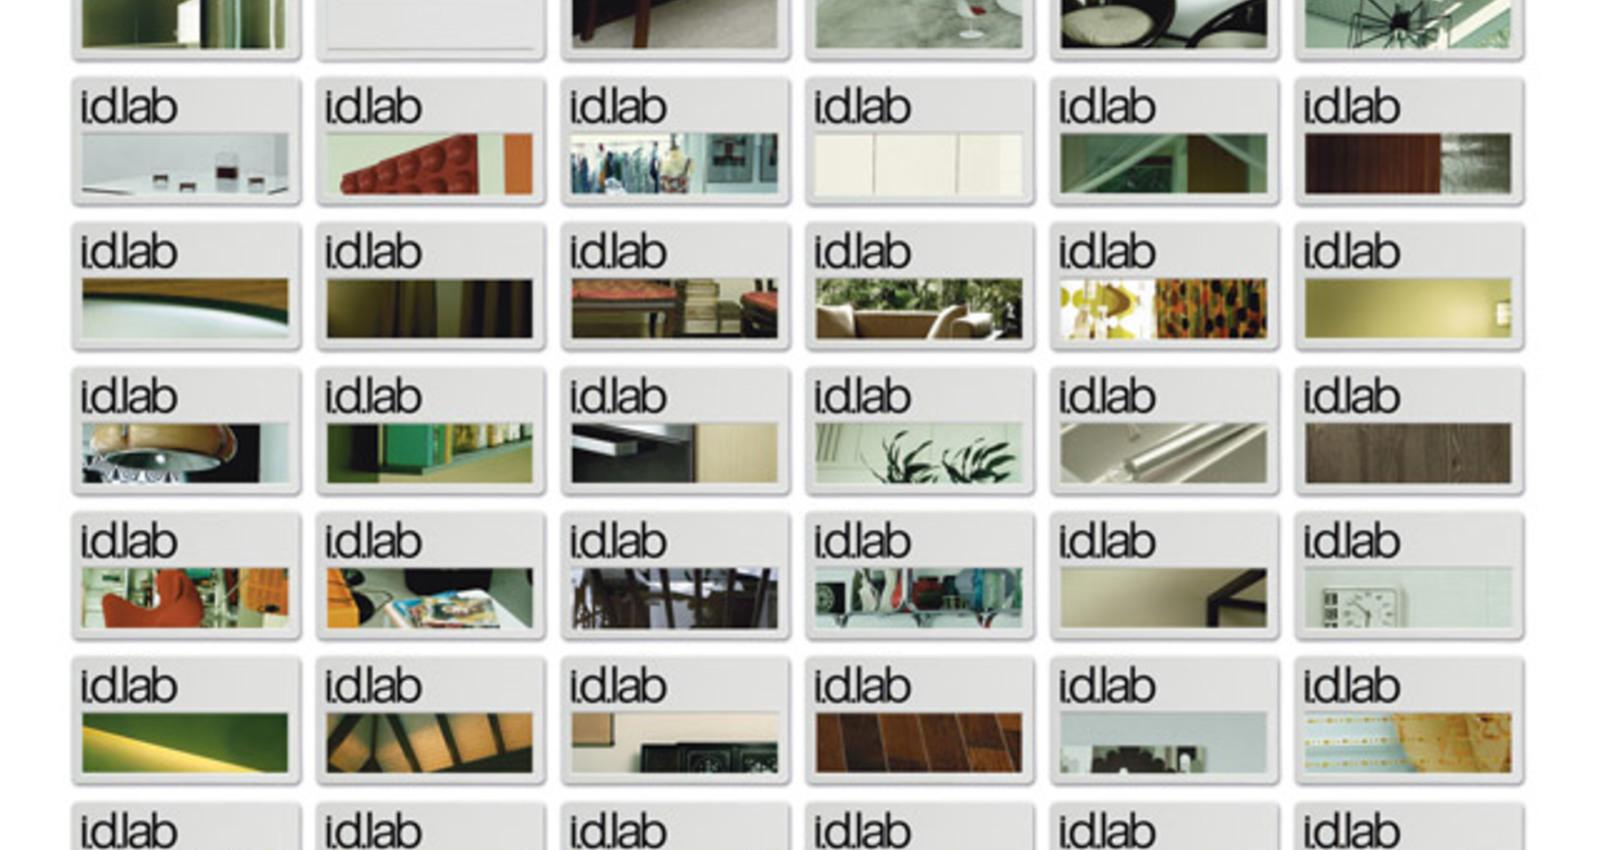 I.D.Lab